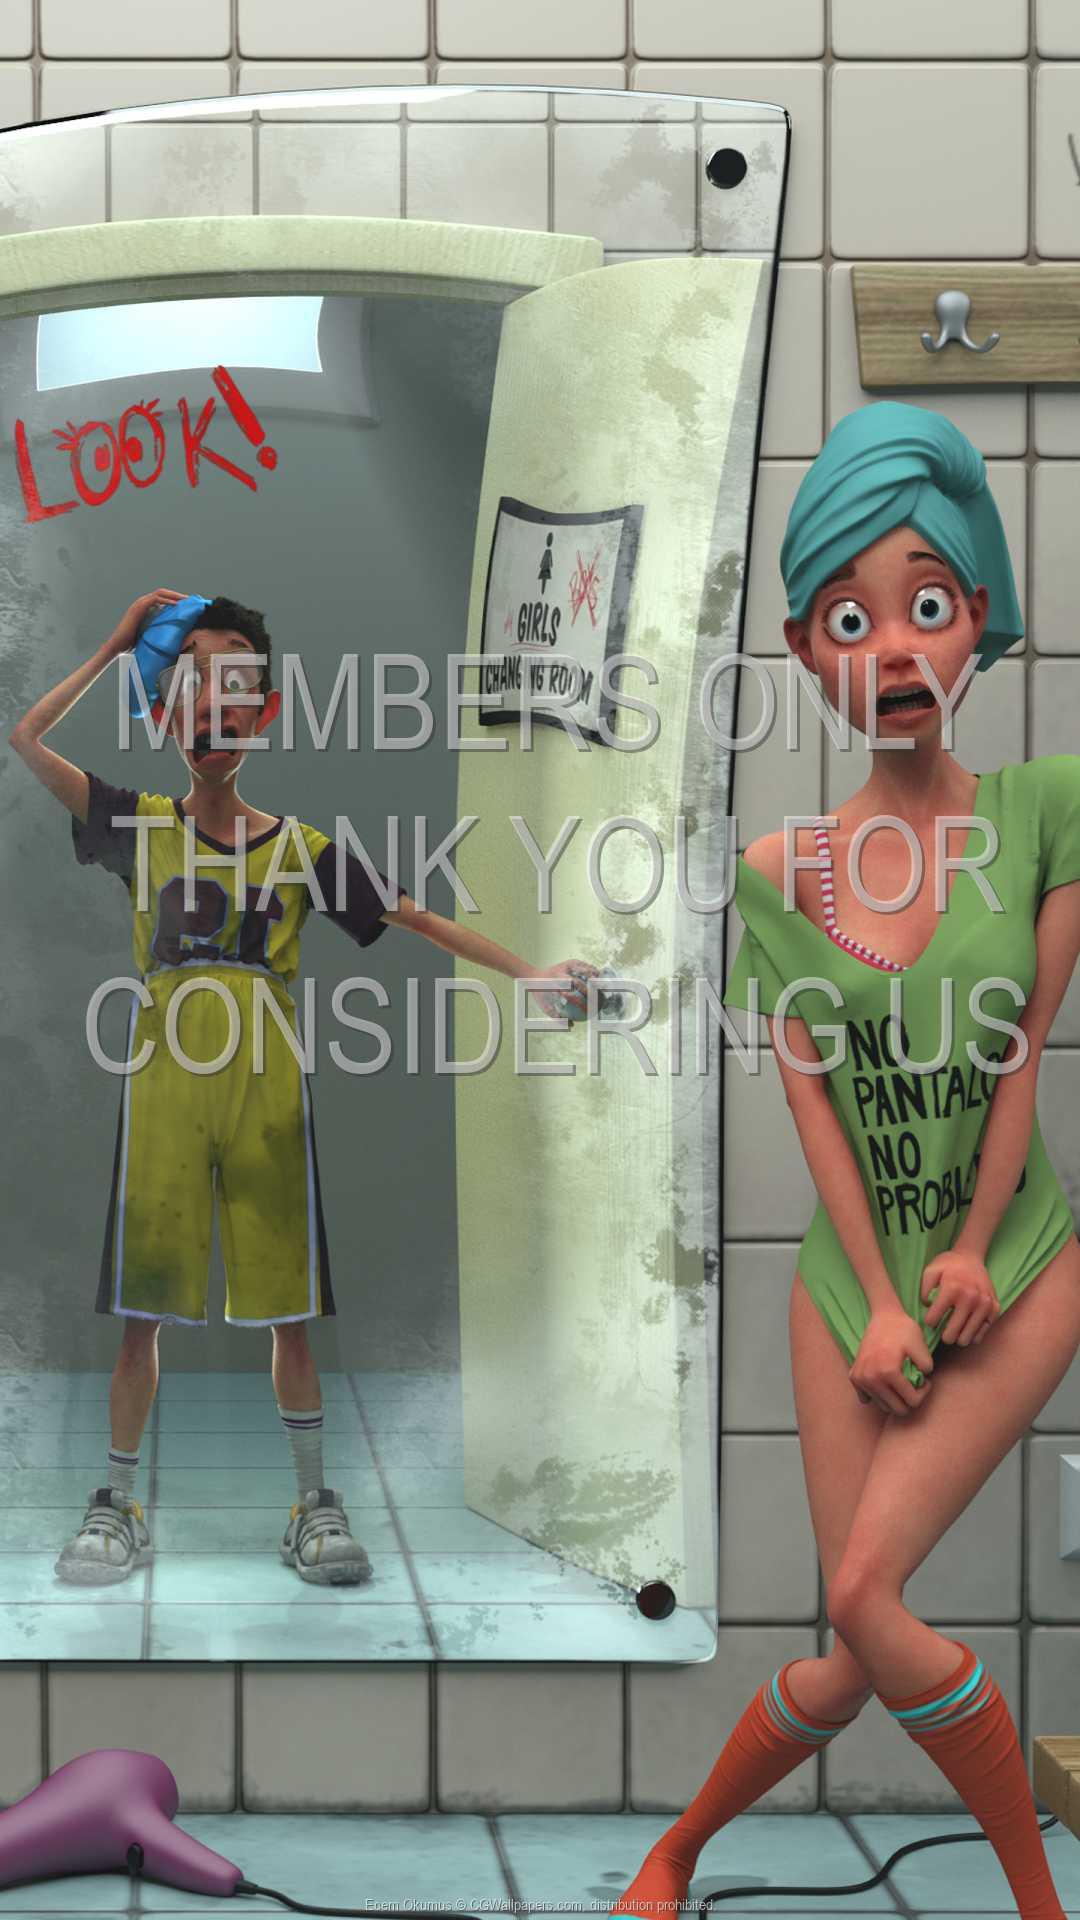 Ecem Okumus 1080p Vertical Mobile wallpaper or background 01